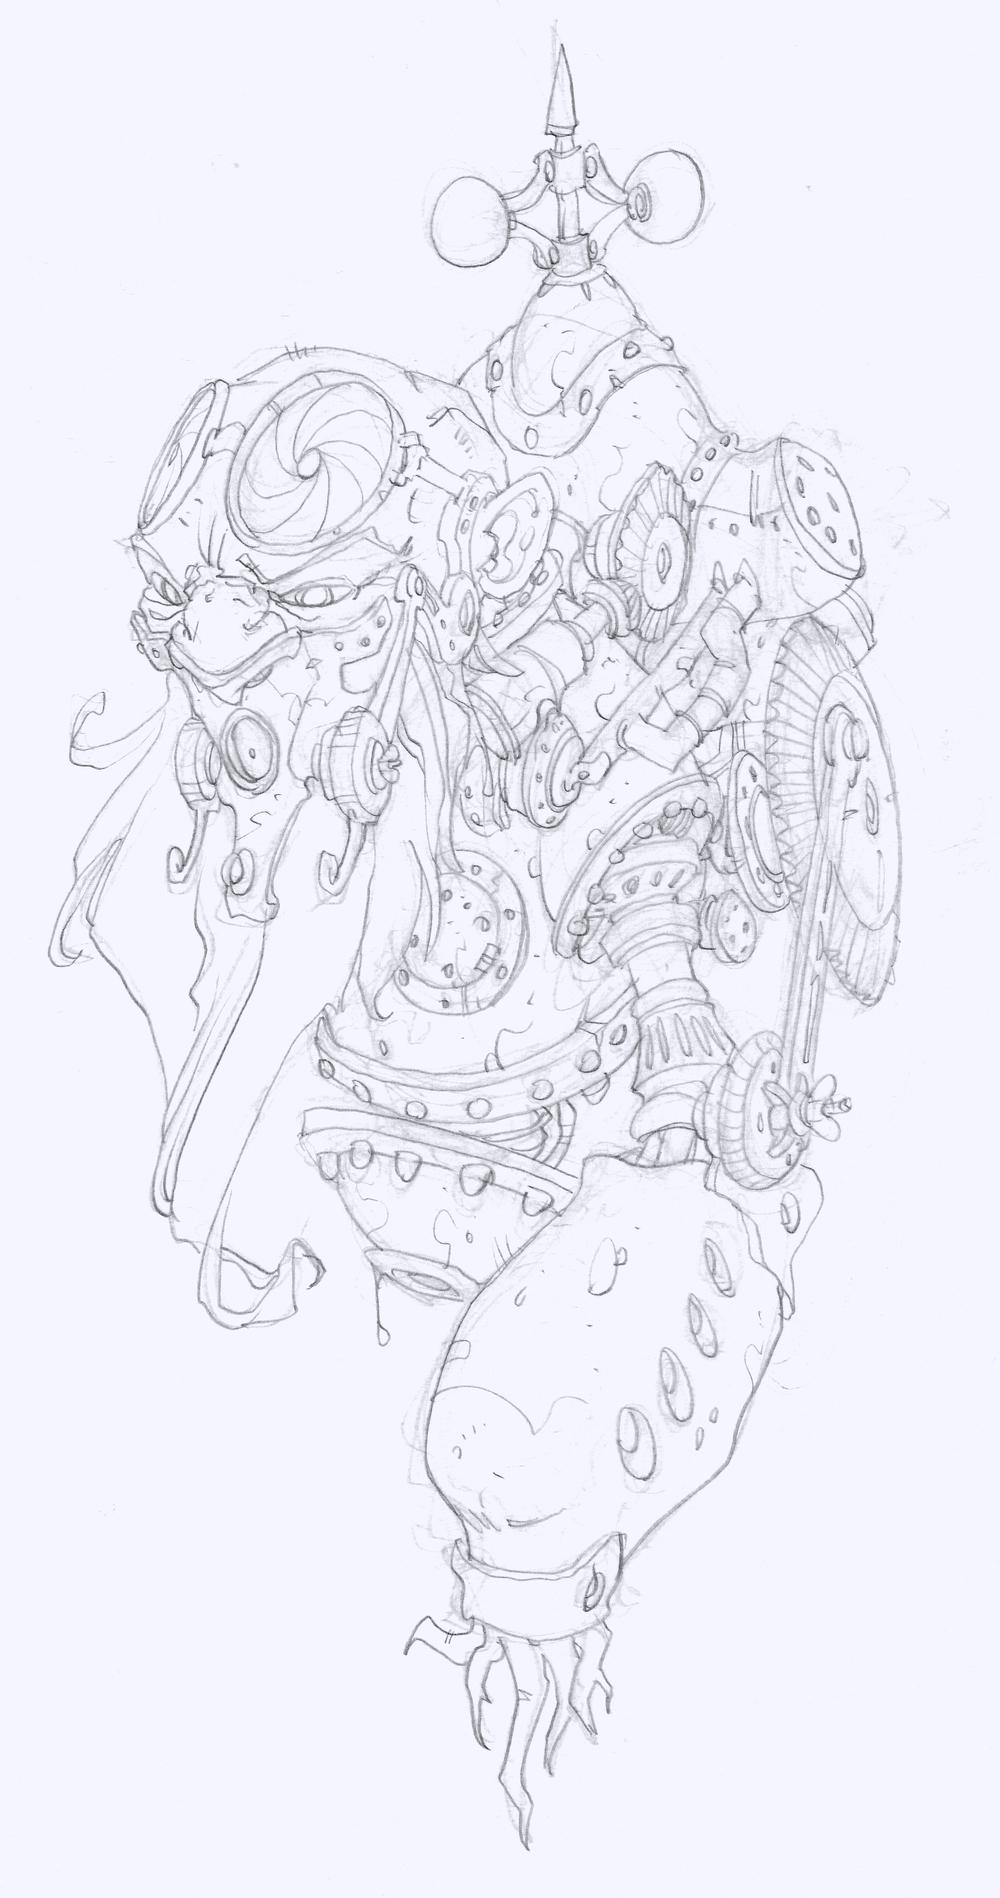 Rackham | Confrontation/Rag'Narok - Dwarves of Tir-Na-Bor | Edouard Guiton